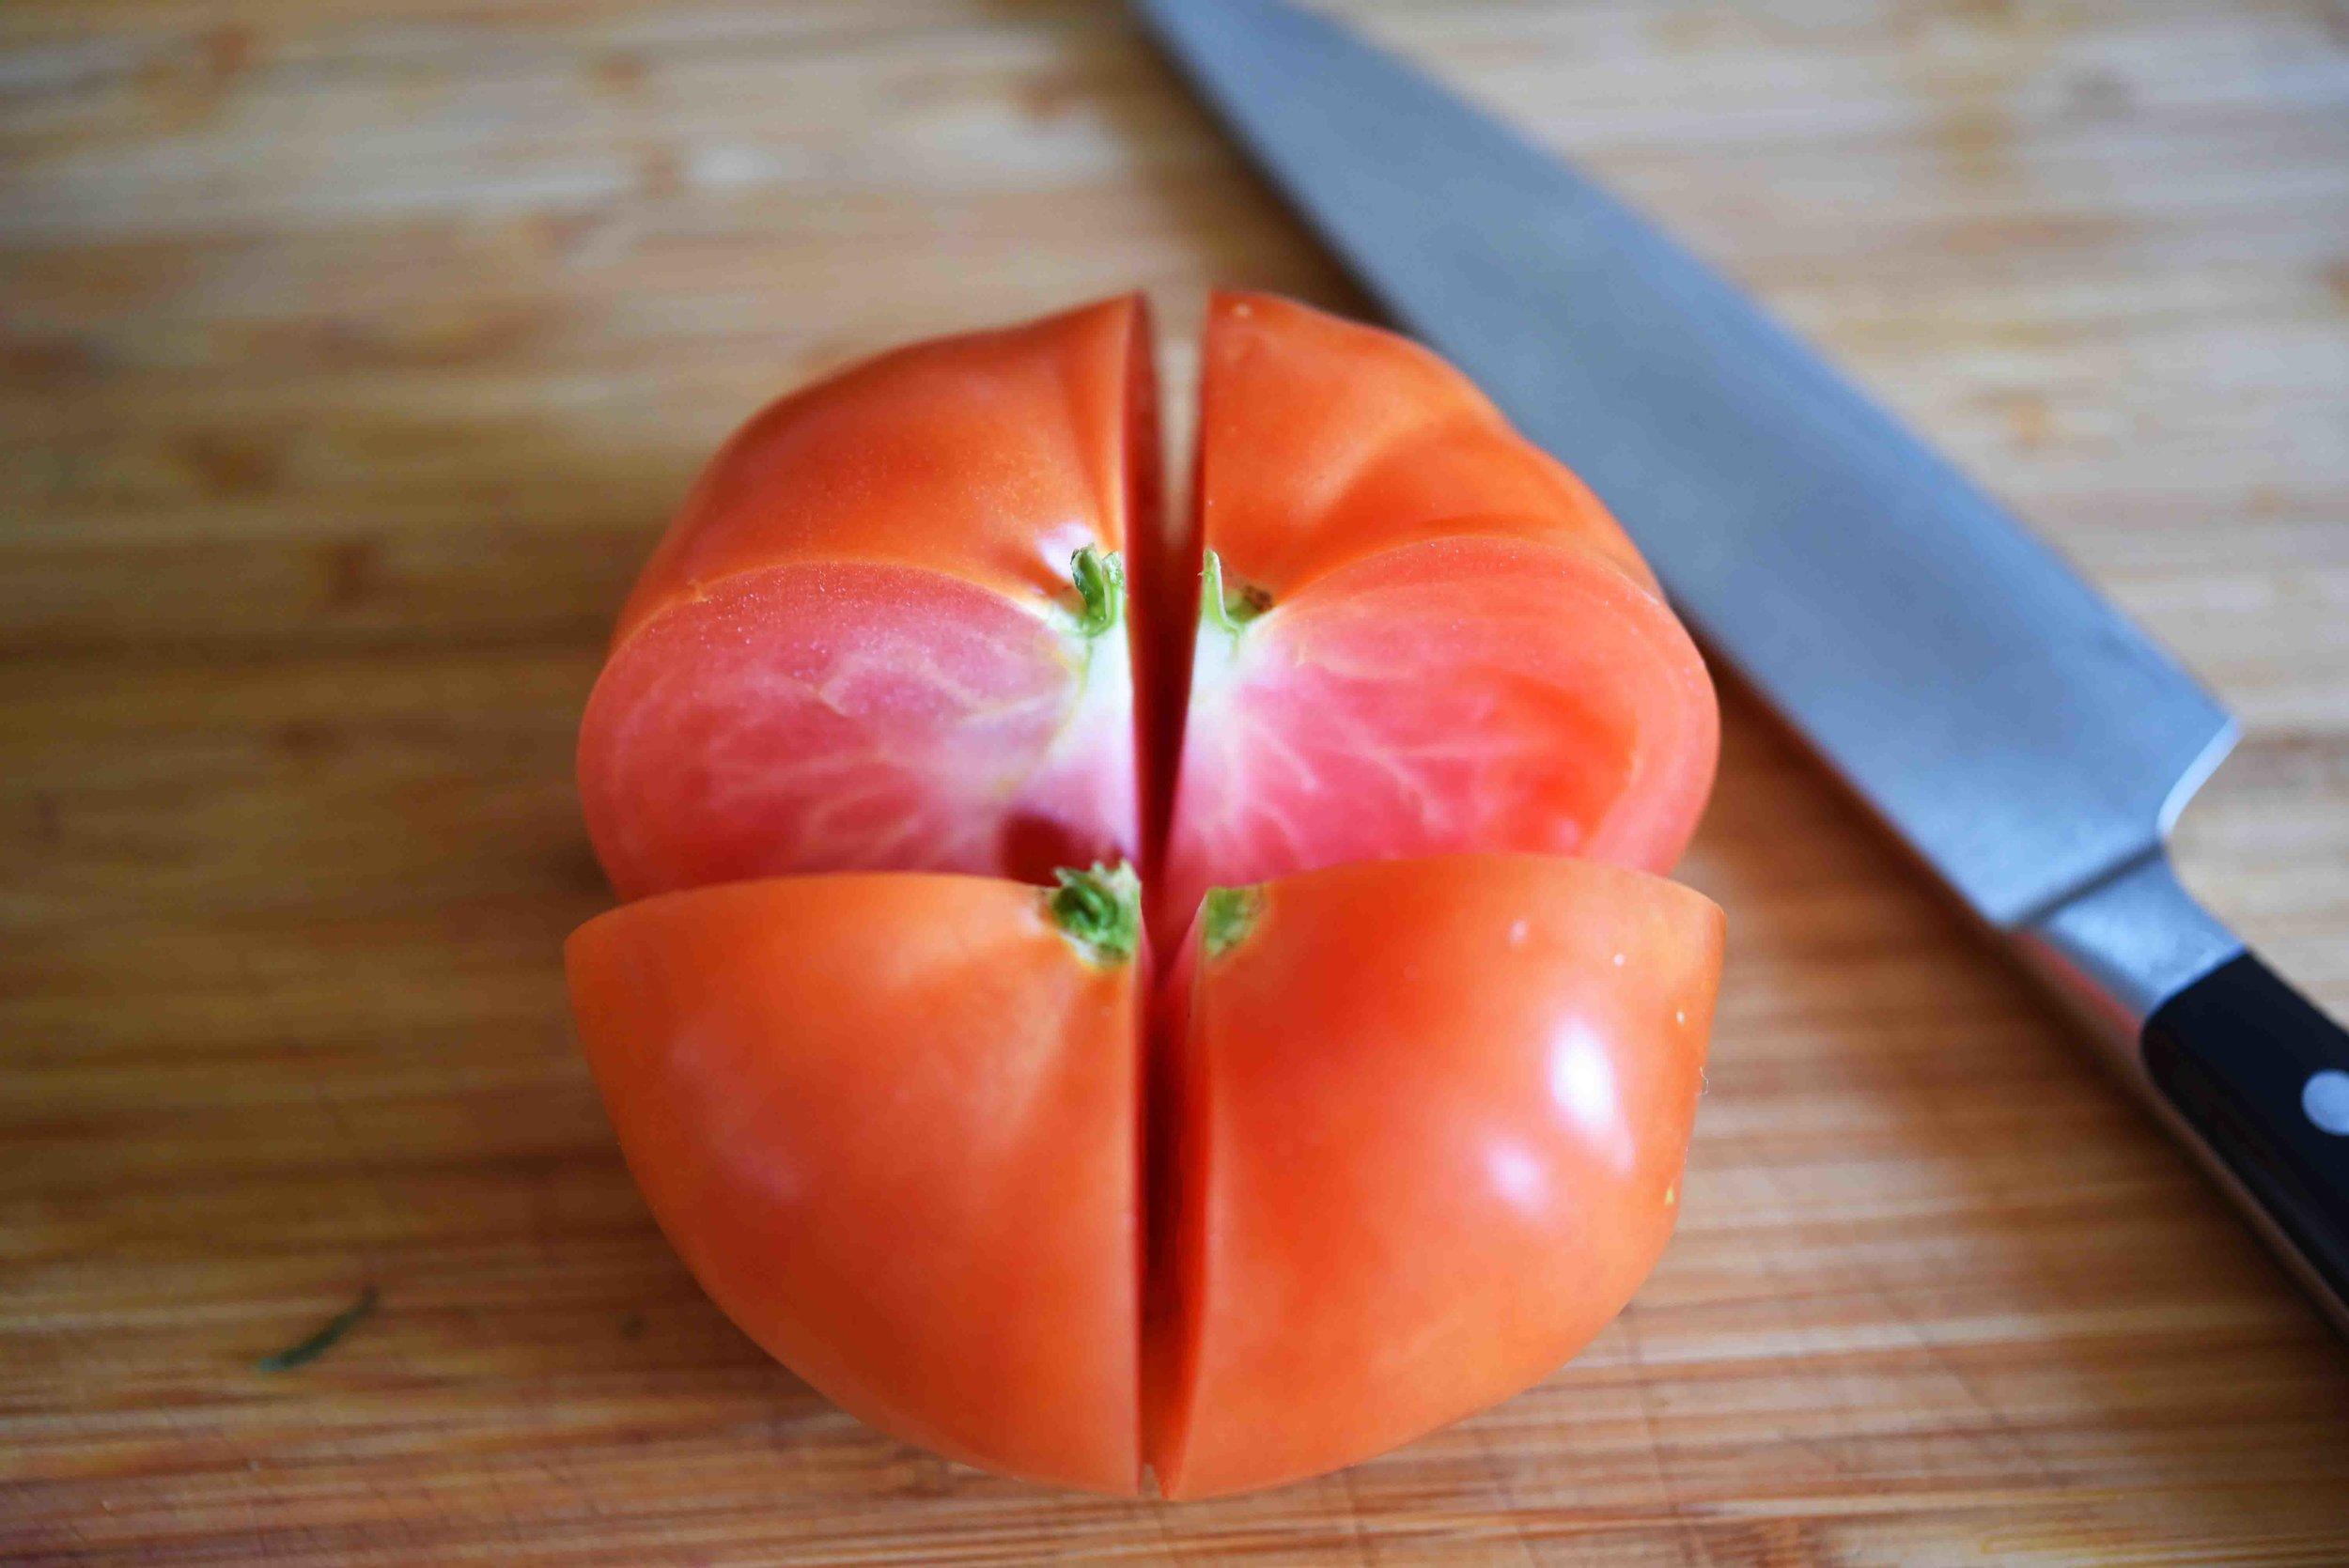 Blooming Tomato 1.jpg